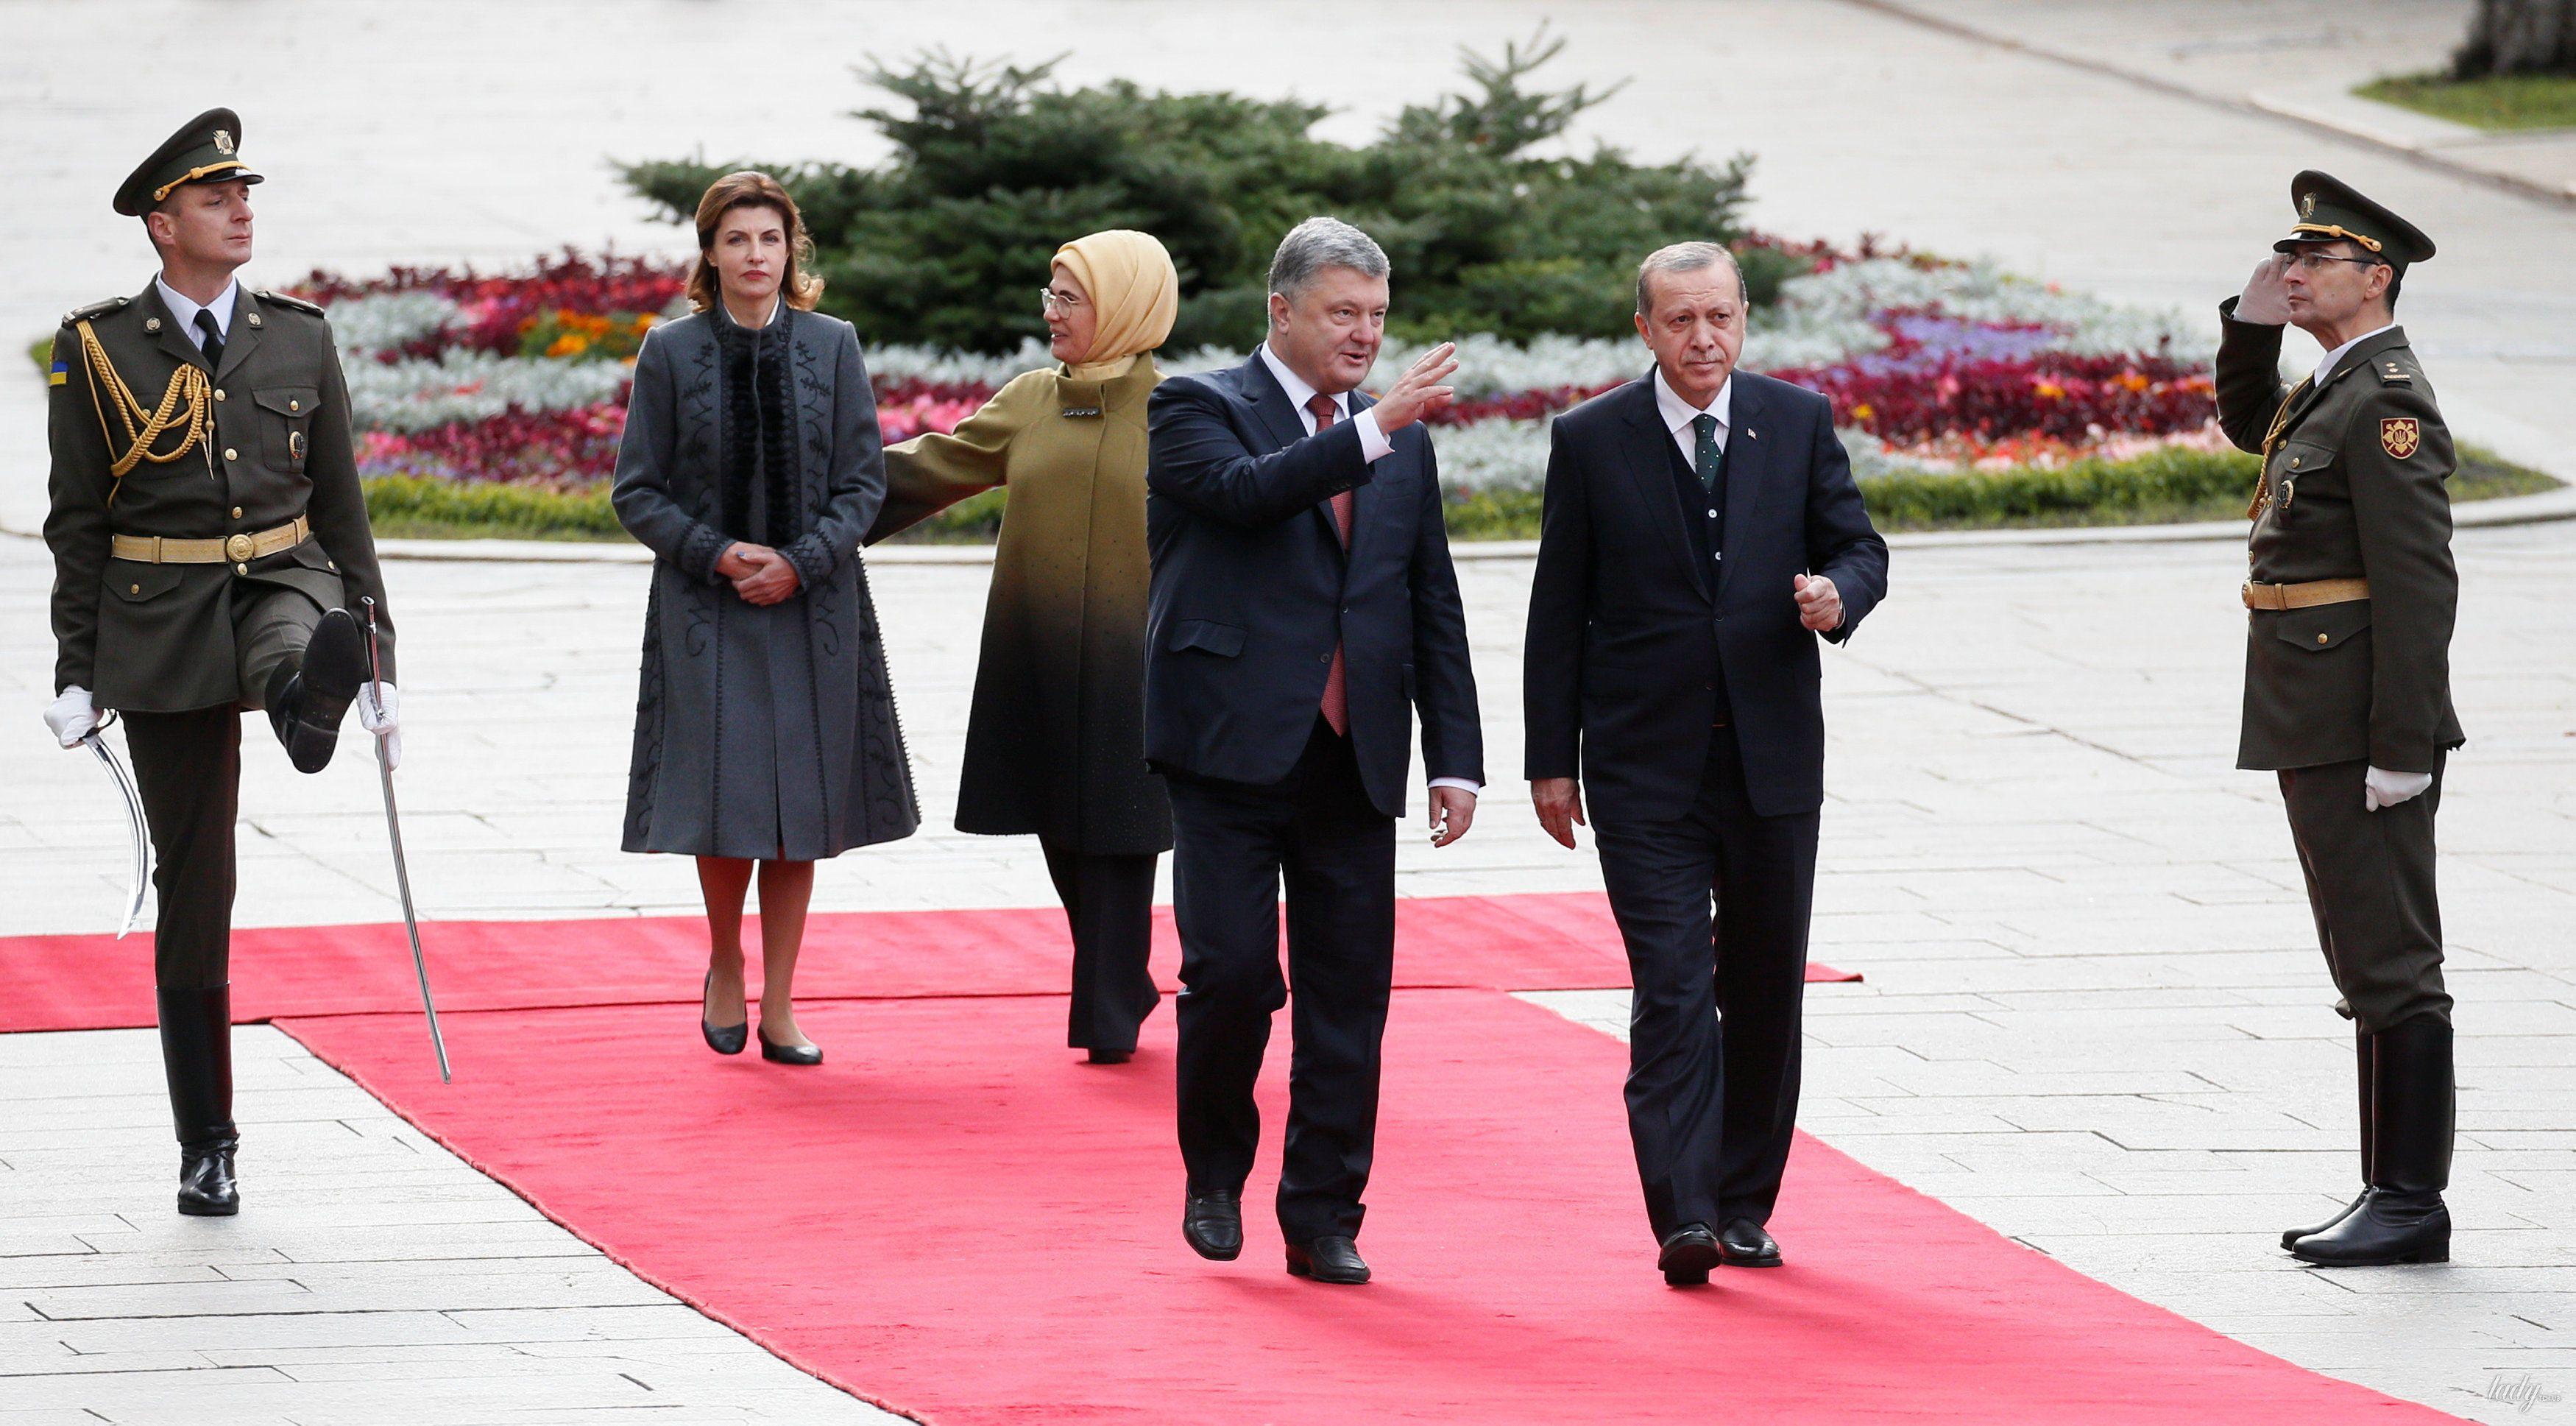 Марина Порошенко, Петр Порошенко, Тайип Эрдоган, Эмине Эрдоган_2